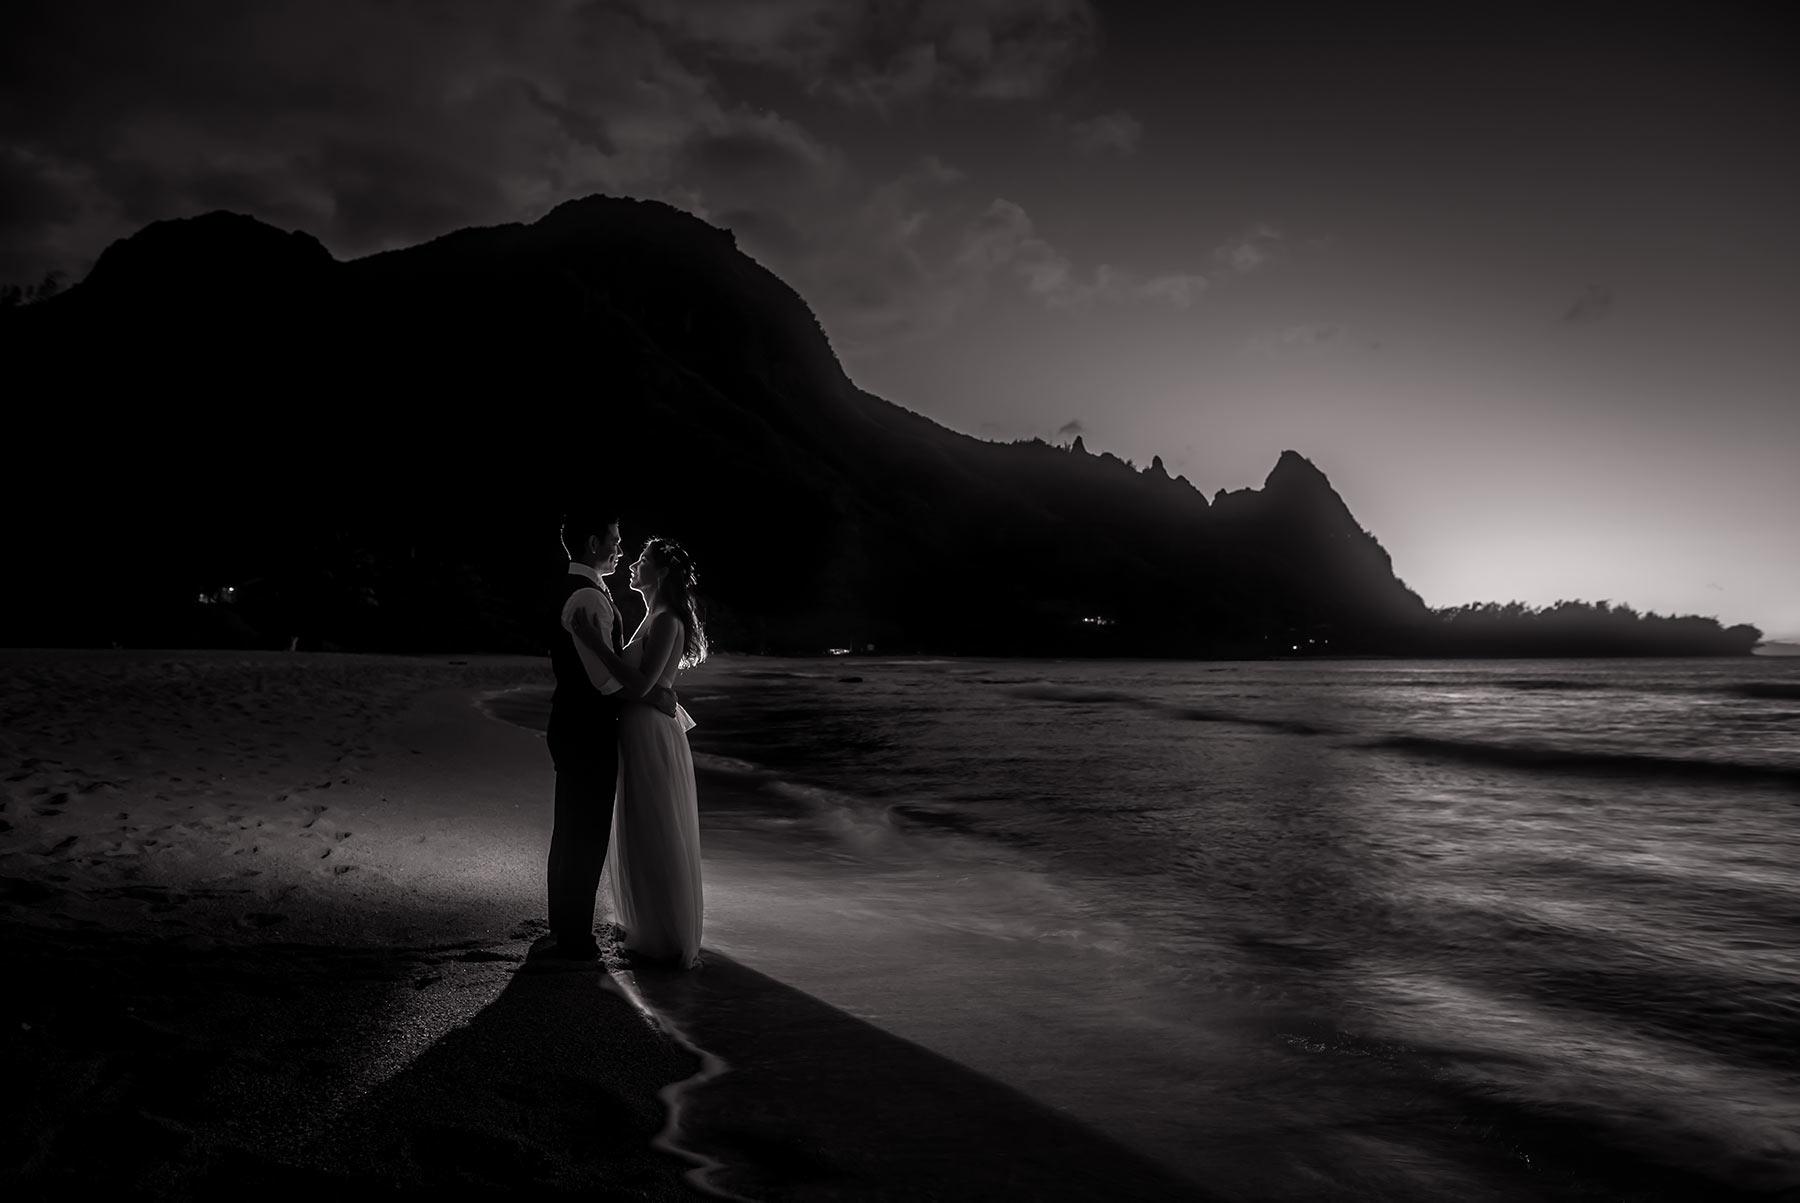 Black and white wedding photograph on the island of Kauai, Hawaii.